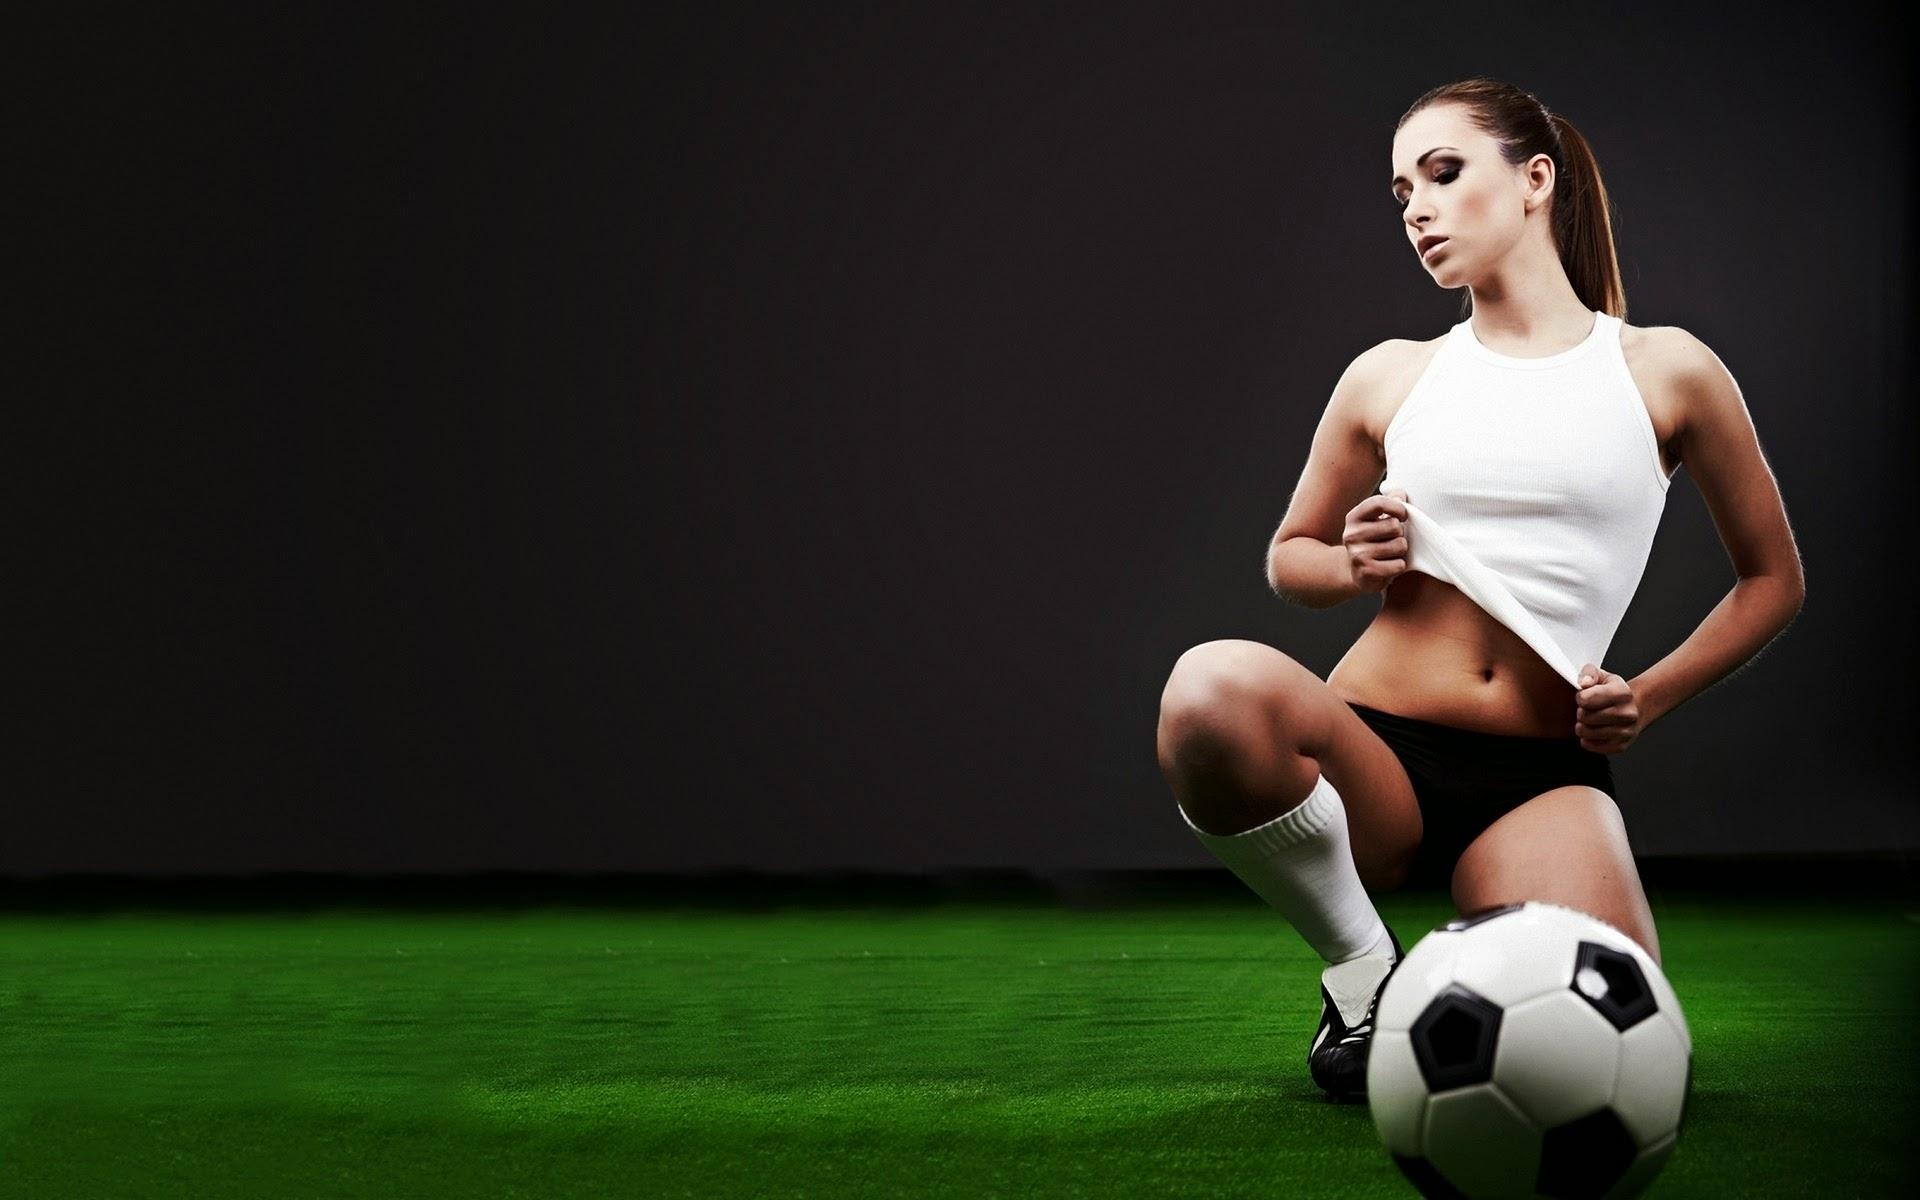 sexy soccer wallpaper 73901